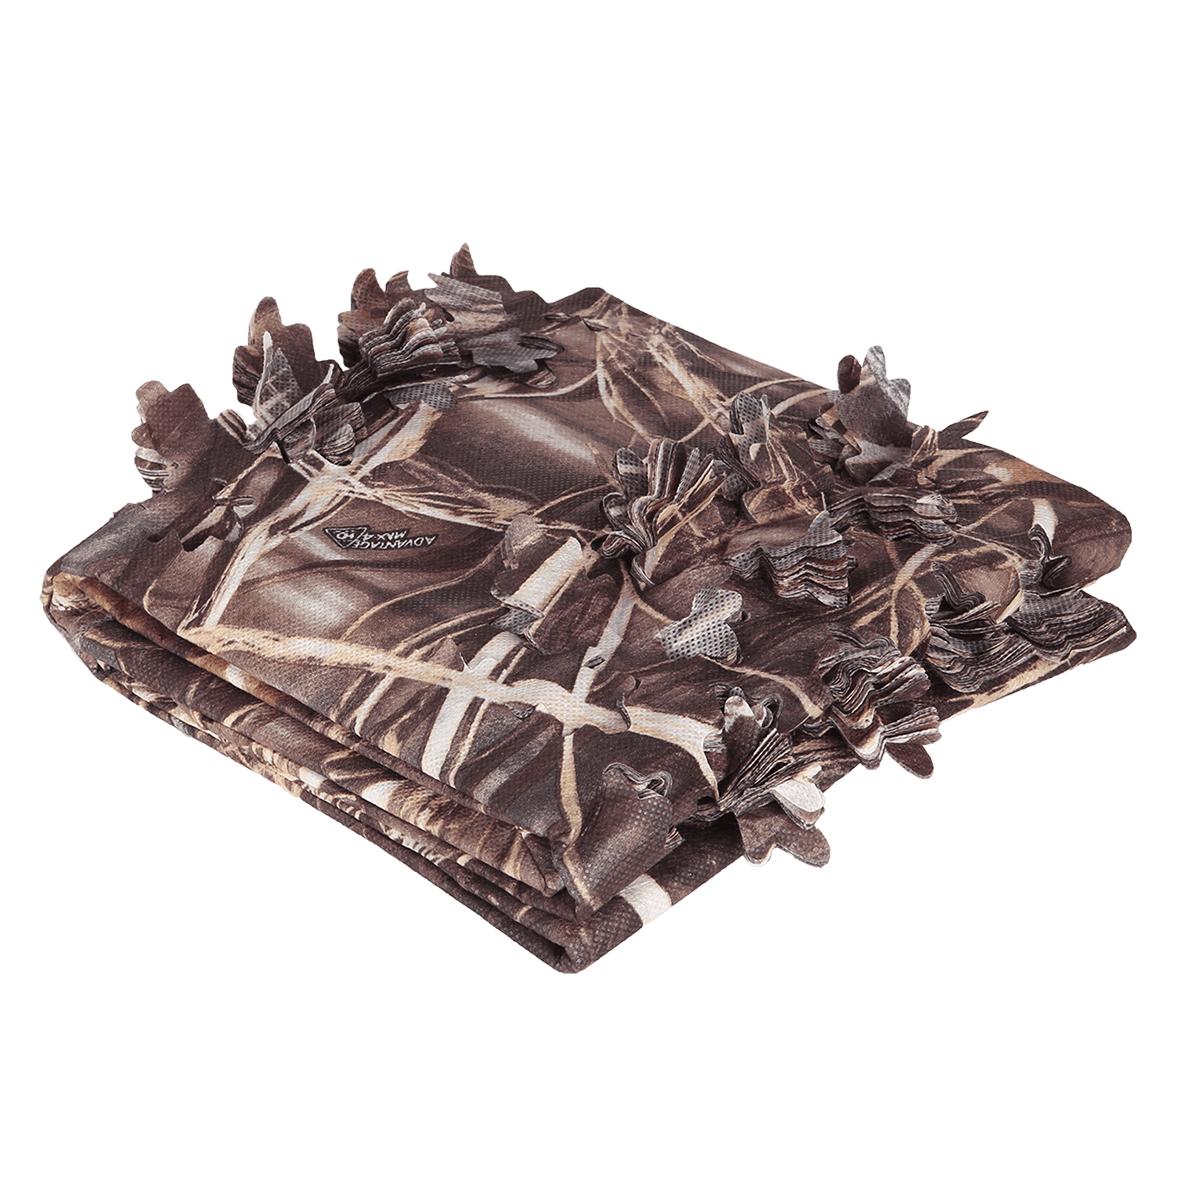 Amersitep 3D Tarnnetz - Realtree MAX-5 - Gänsejagd